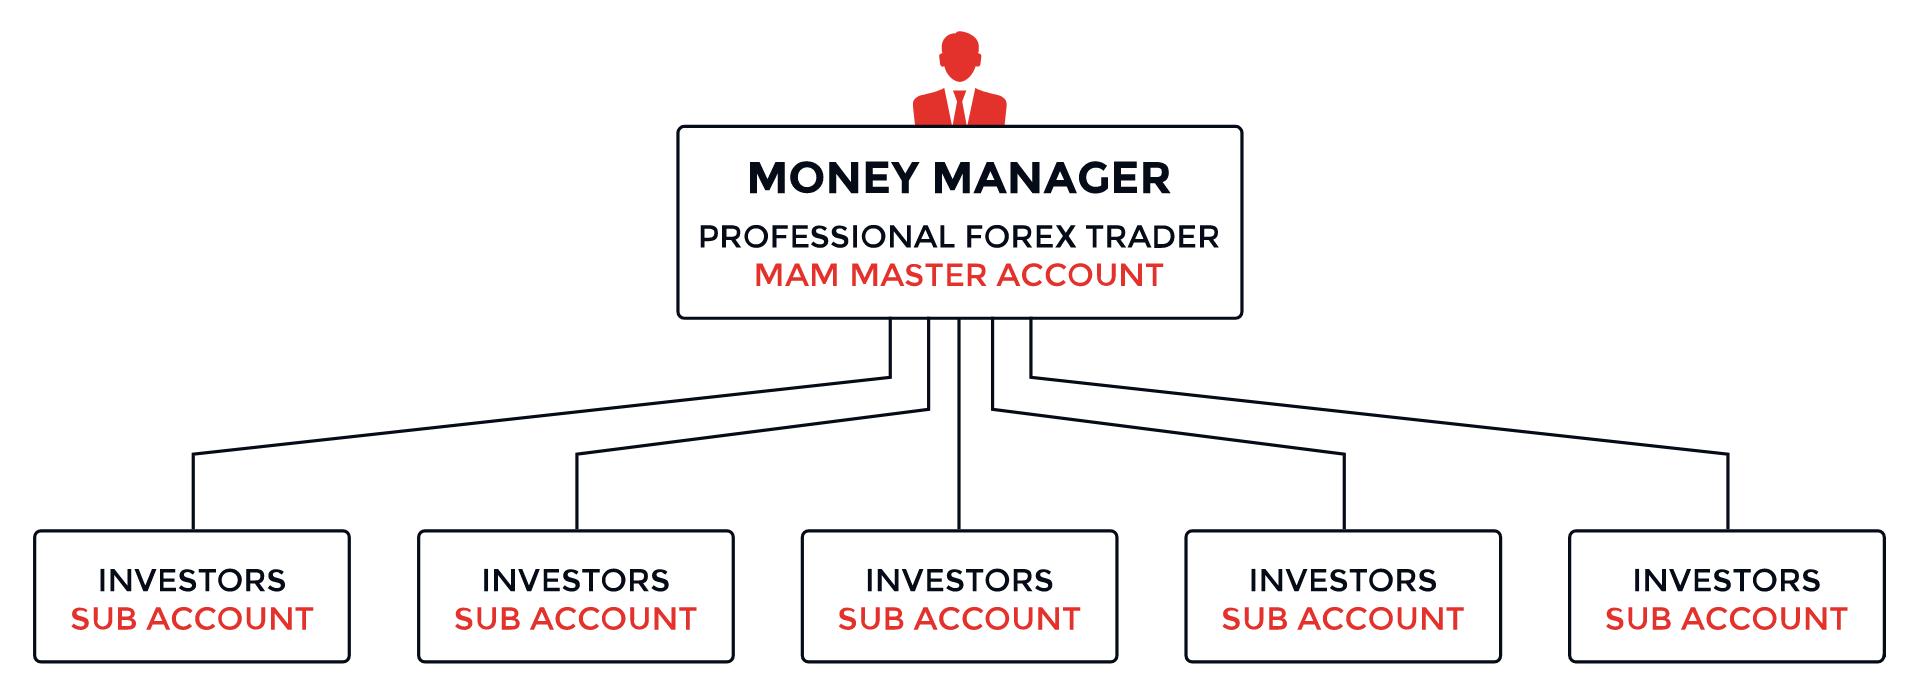 moneymanagerchart